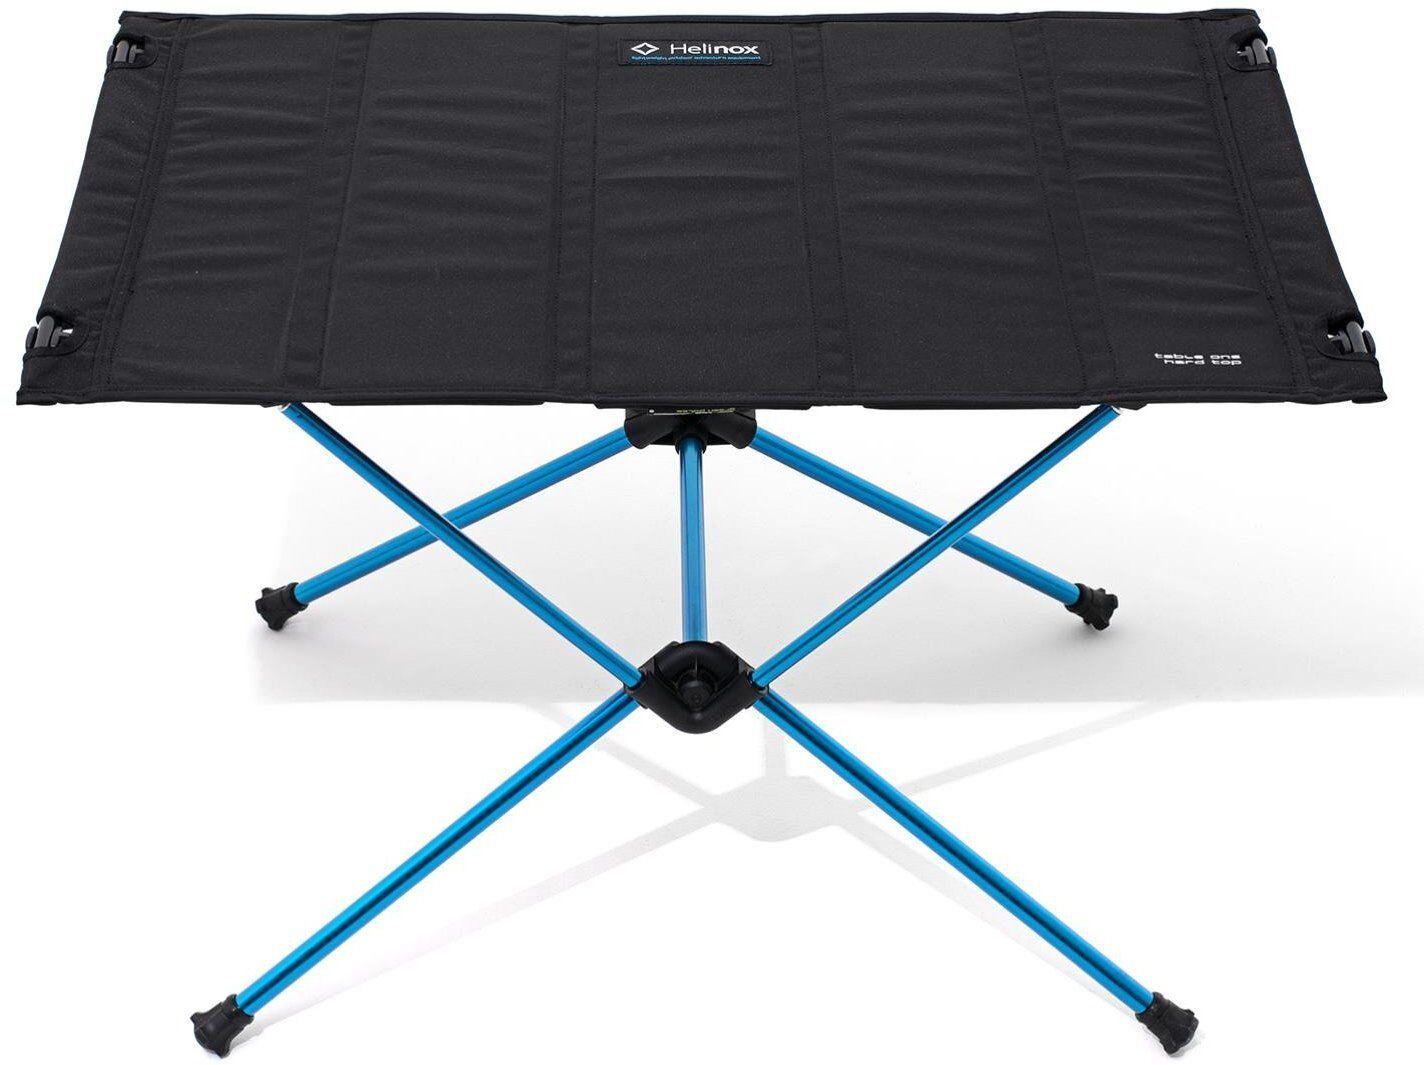 Helinox Hardtop Tisch One Hardtop Helinox Tisch Leicht Zelten Tisch b8e3d4